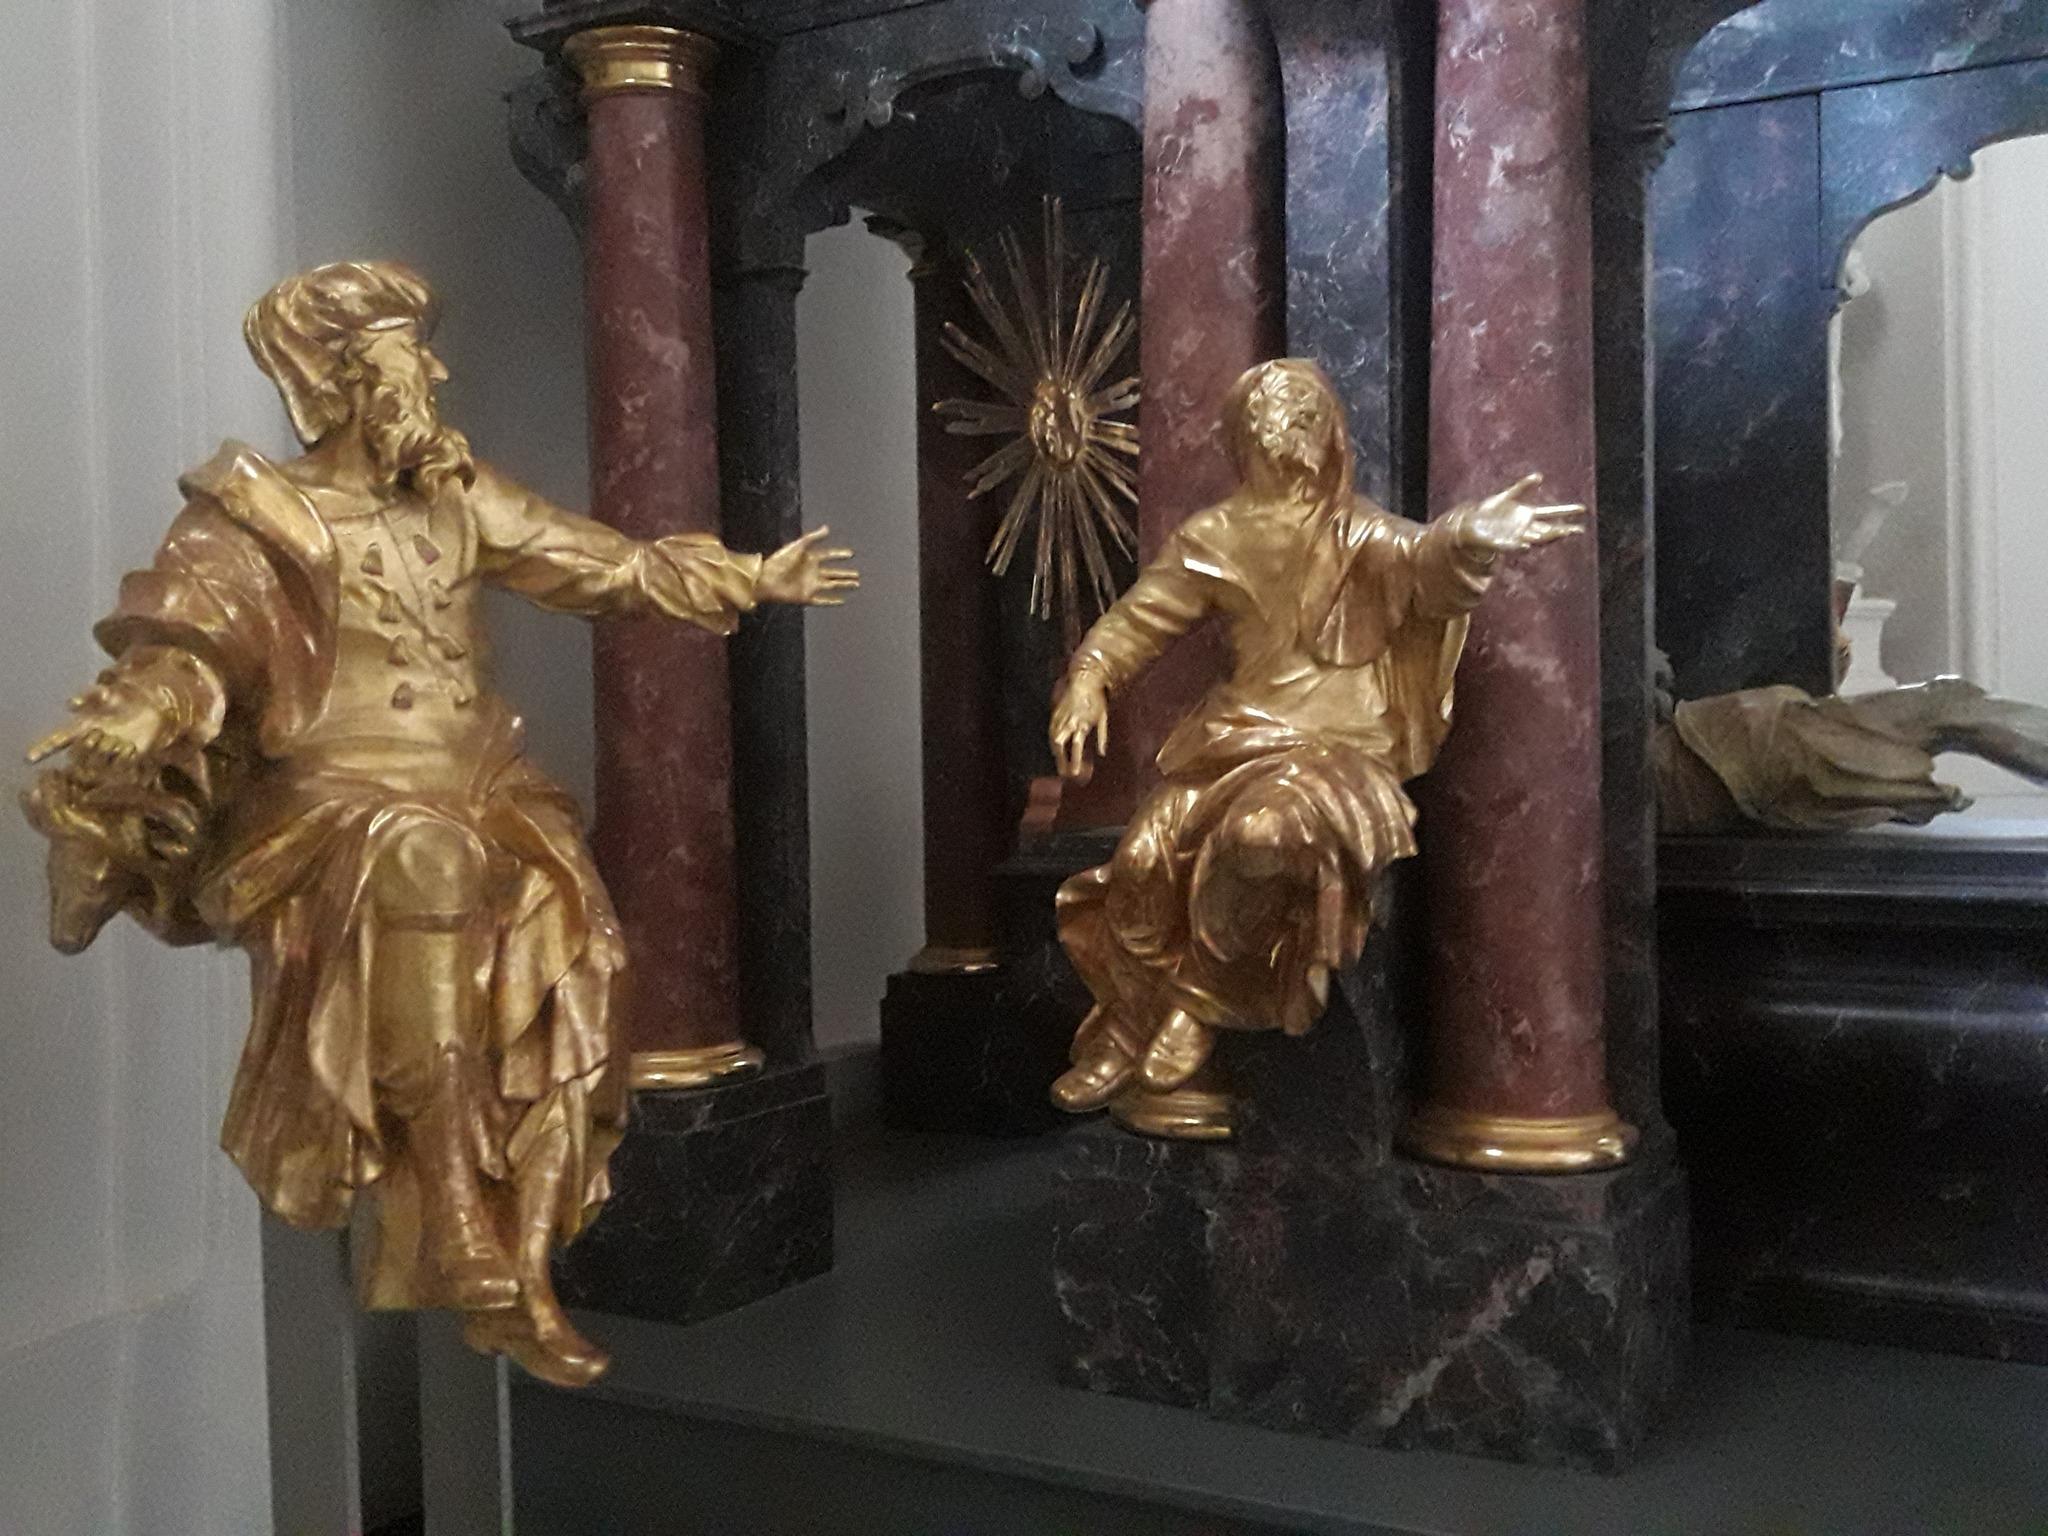 ГРац, мавзолей императора Фердинанда